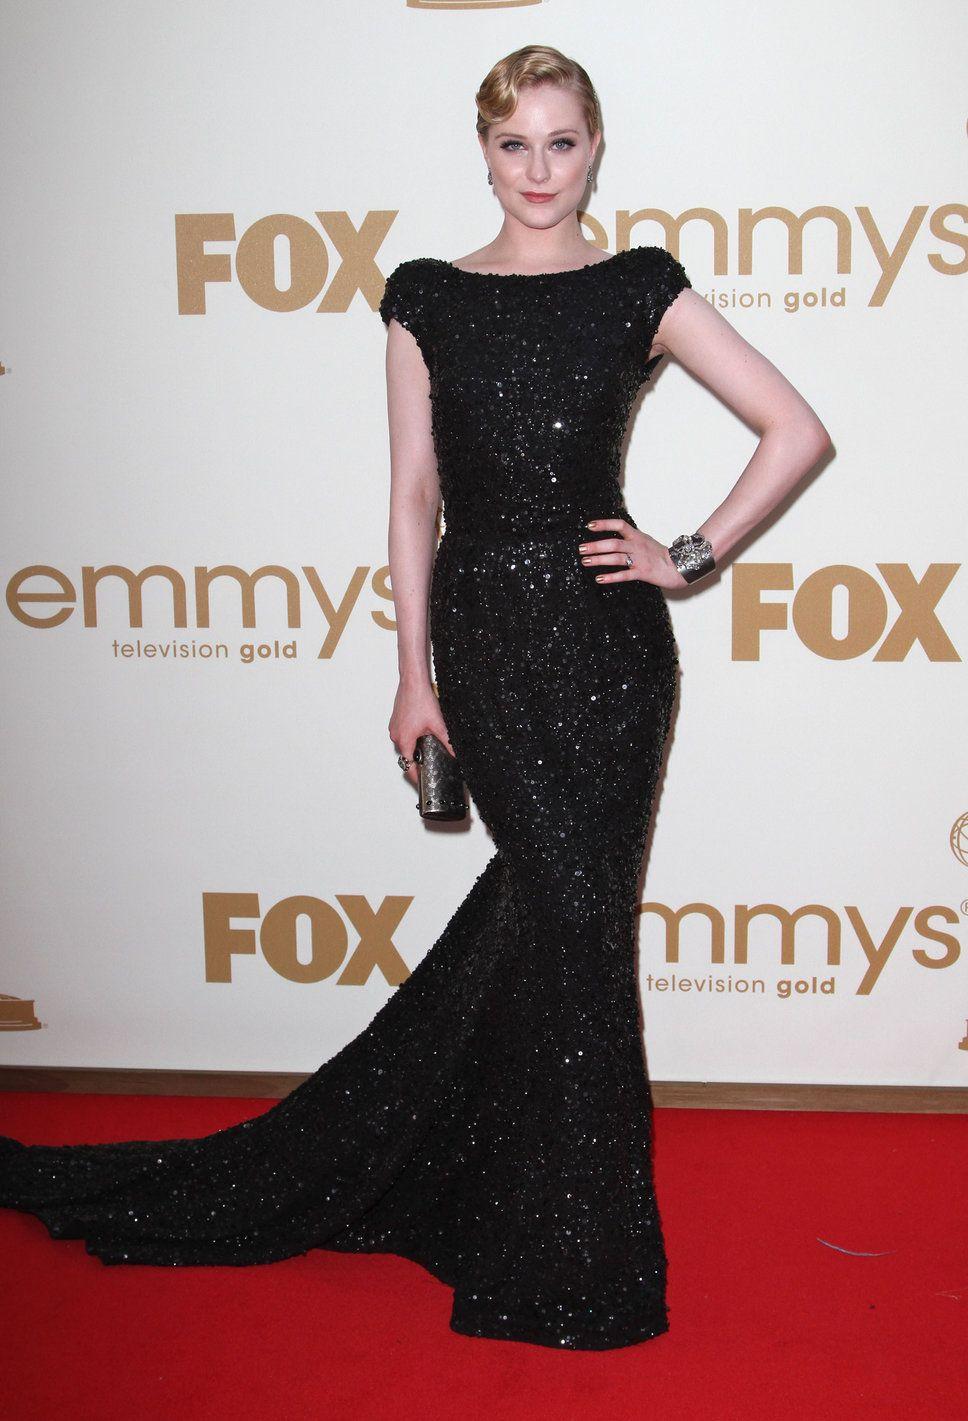 Black dress hollywood - Evan Rachel Wood Old Hollywood Glam Black Long Dress Blond 40s Updo Black Clutch